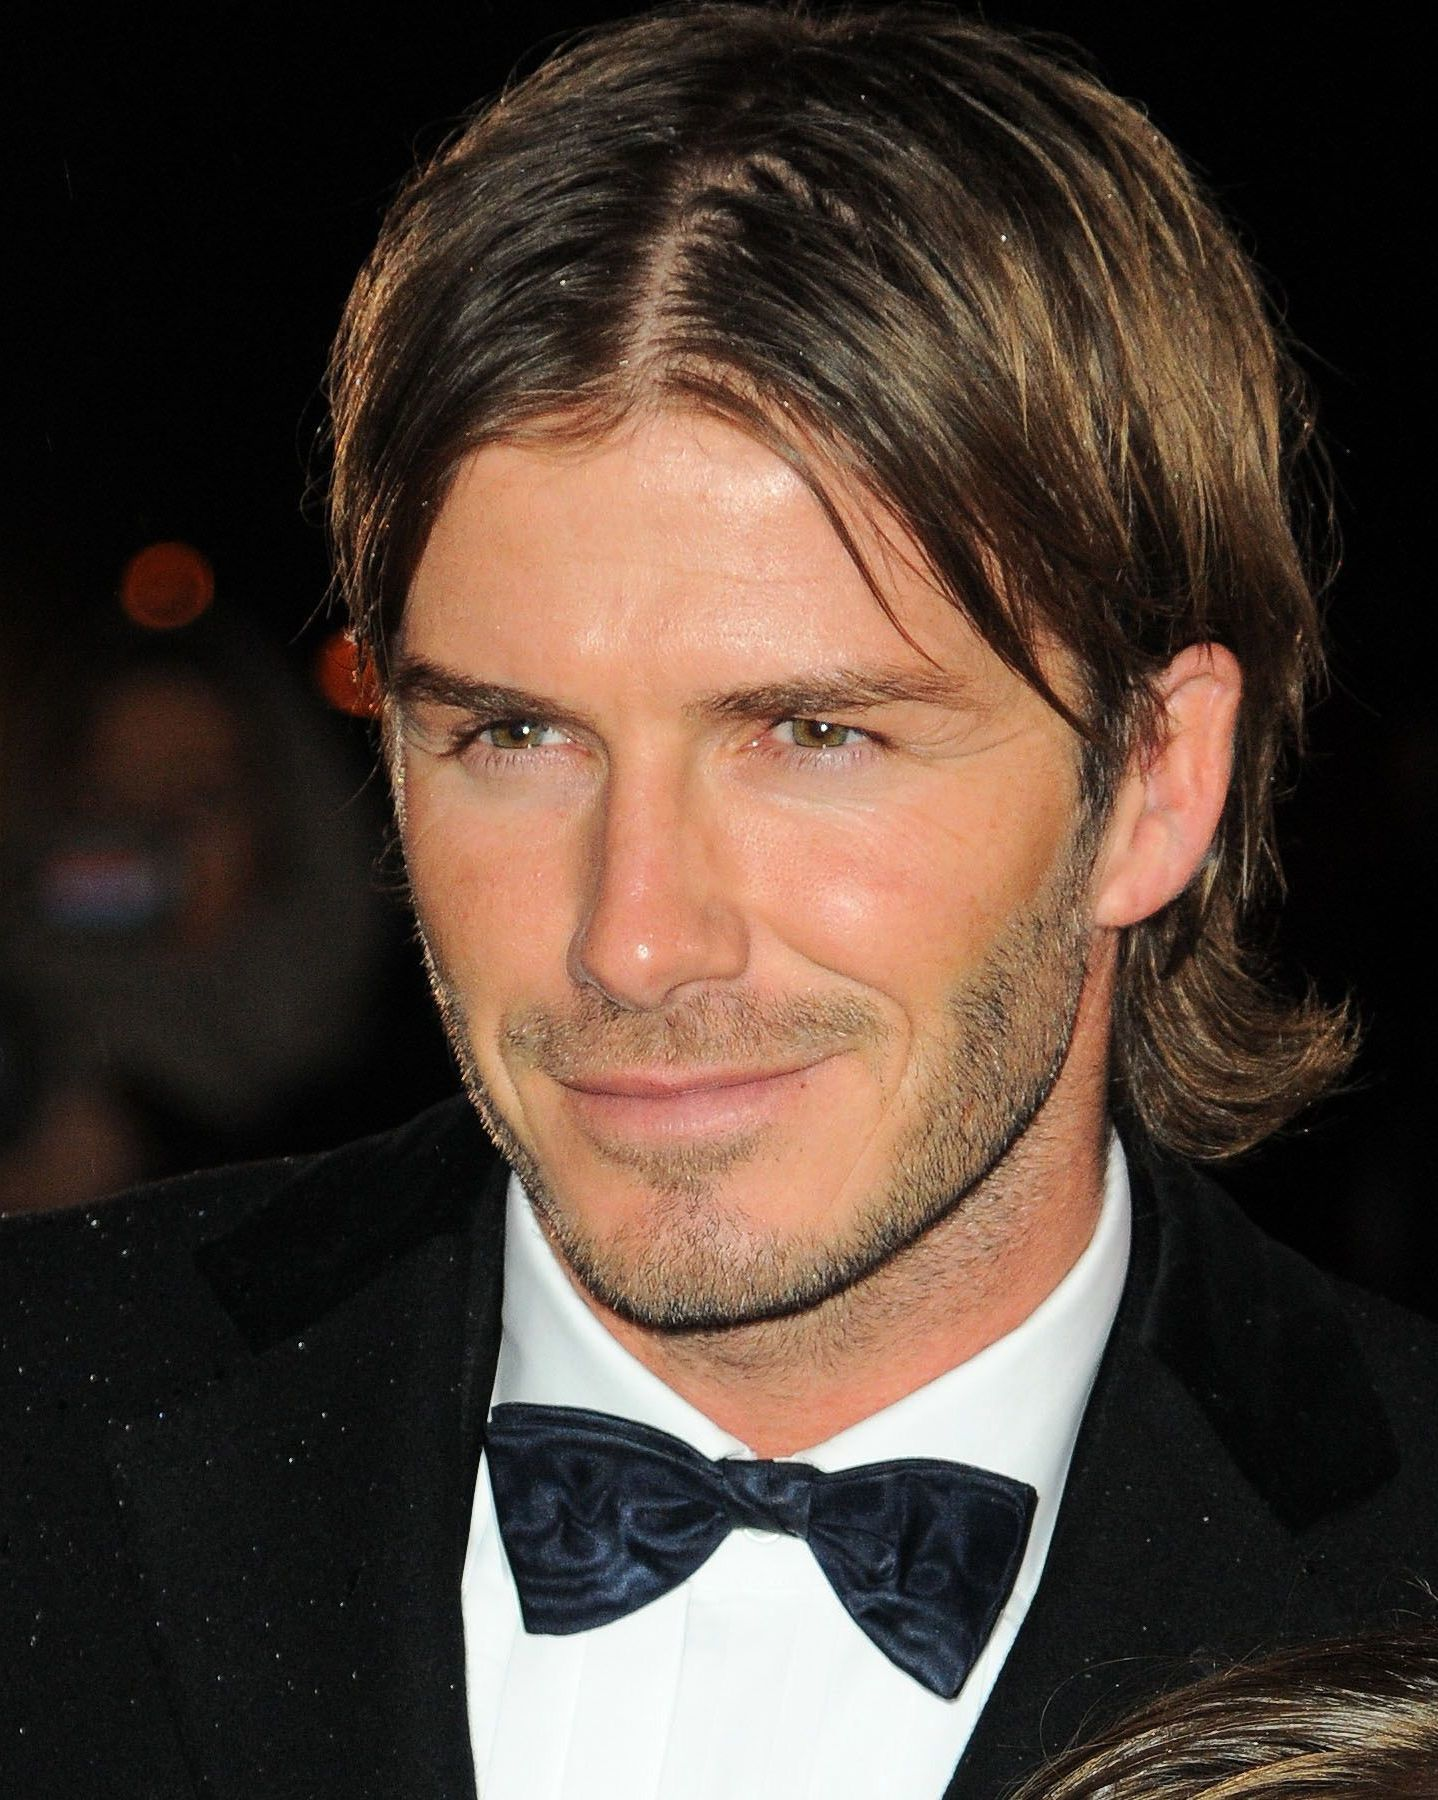 David Beckham Hairstyle Influences